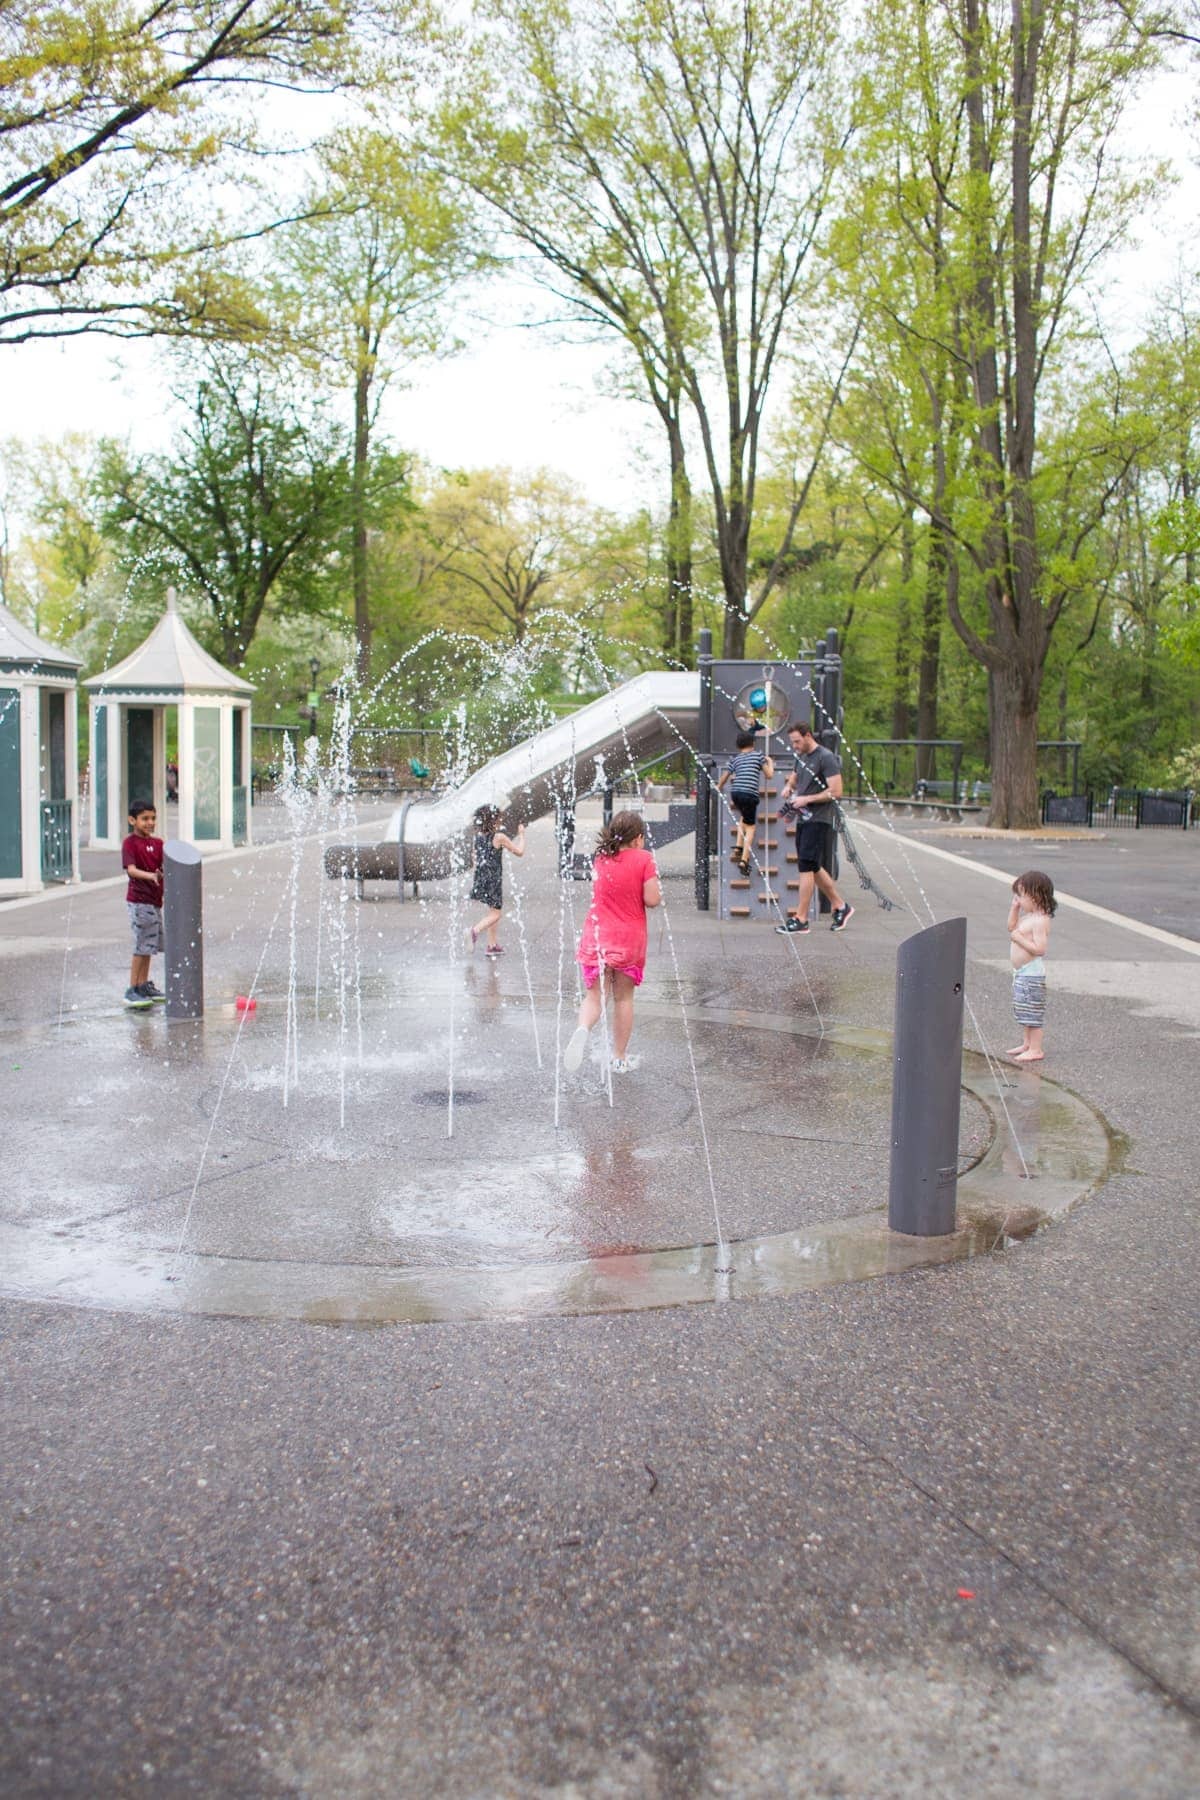 Kids at a playground